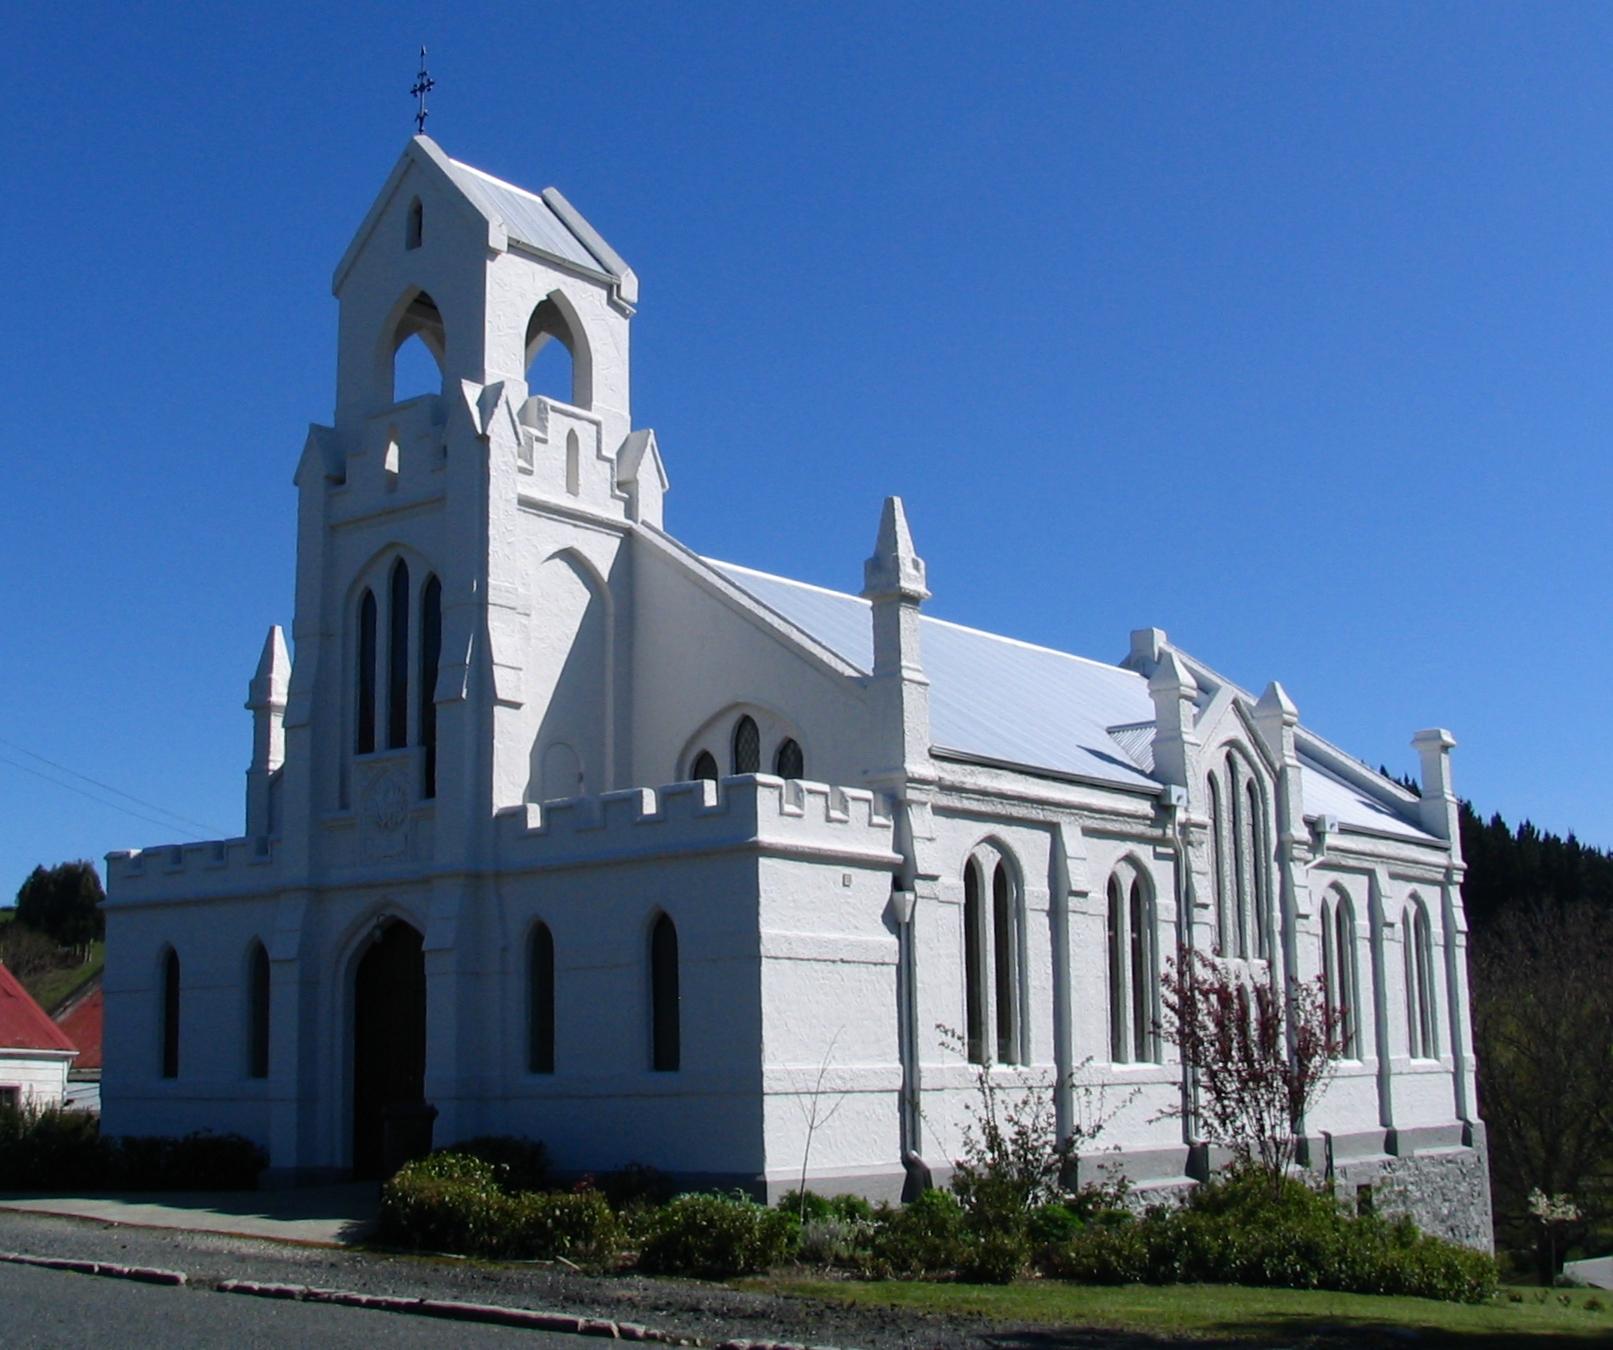 File:Former Lawrence Presbyterian Church Lawrence, New